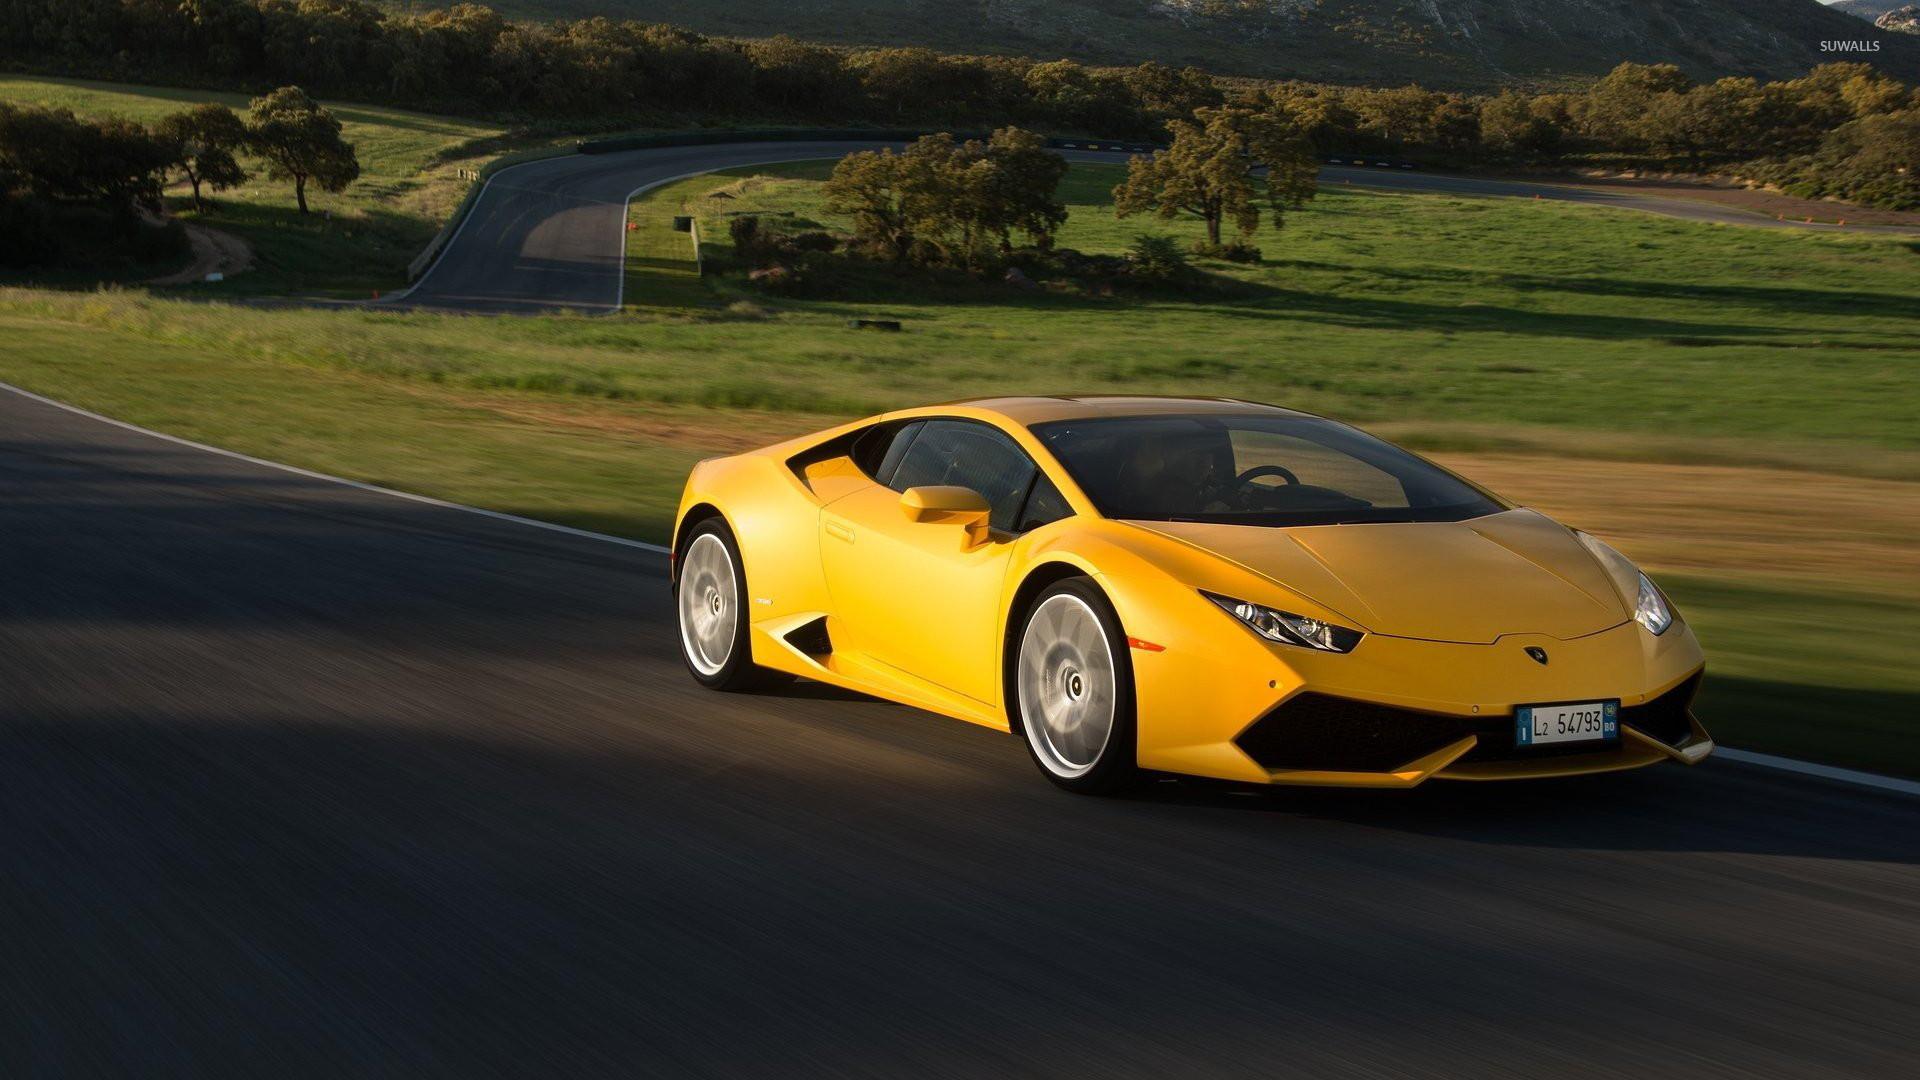 Lamborghini Huracan Wallpapers Images Photos Pictures ...